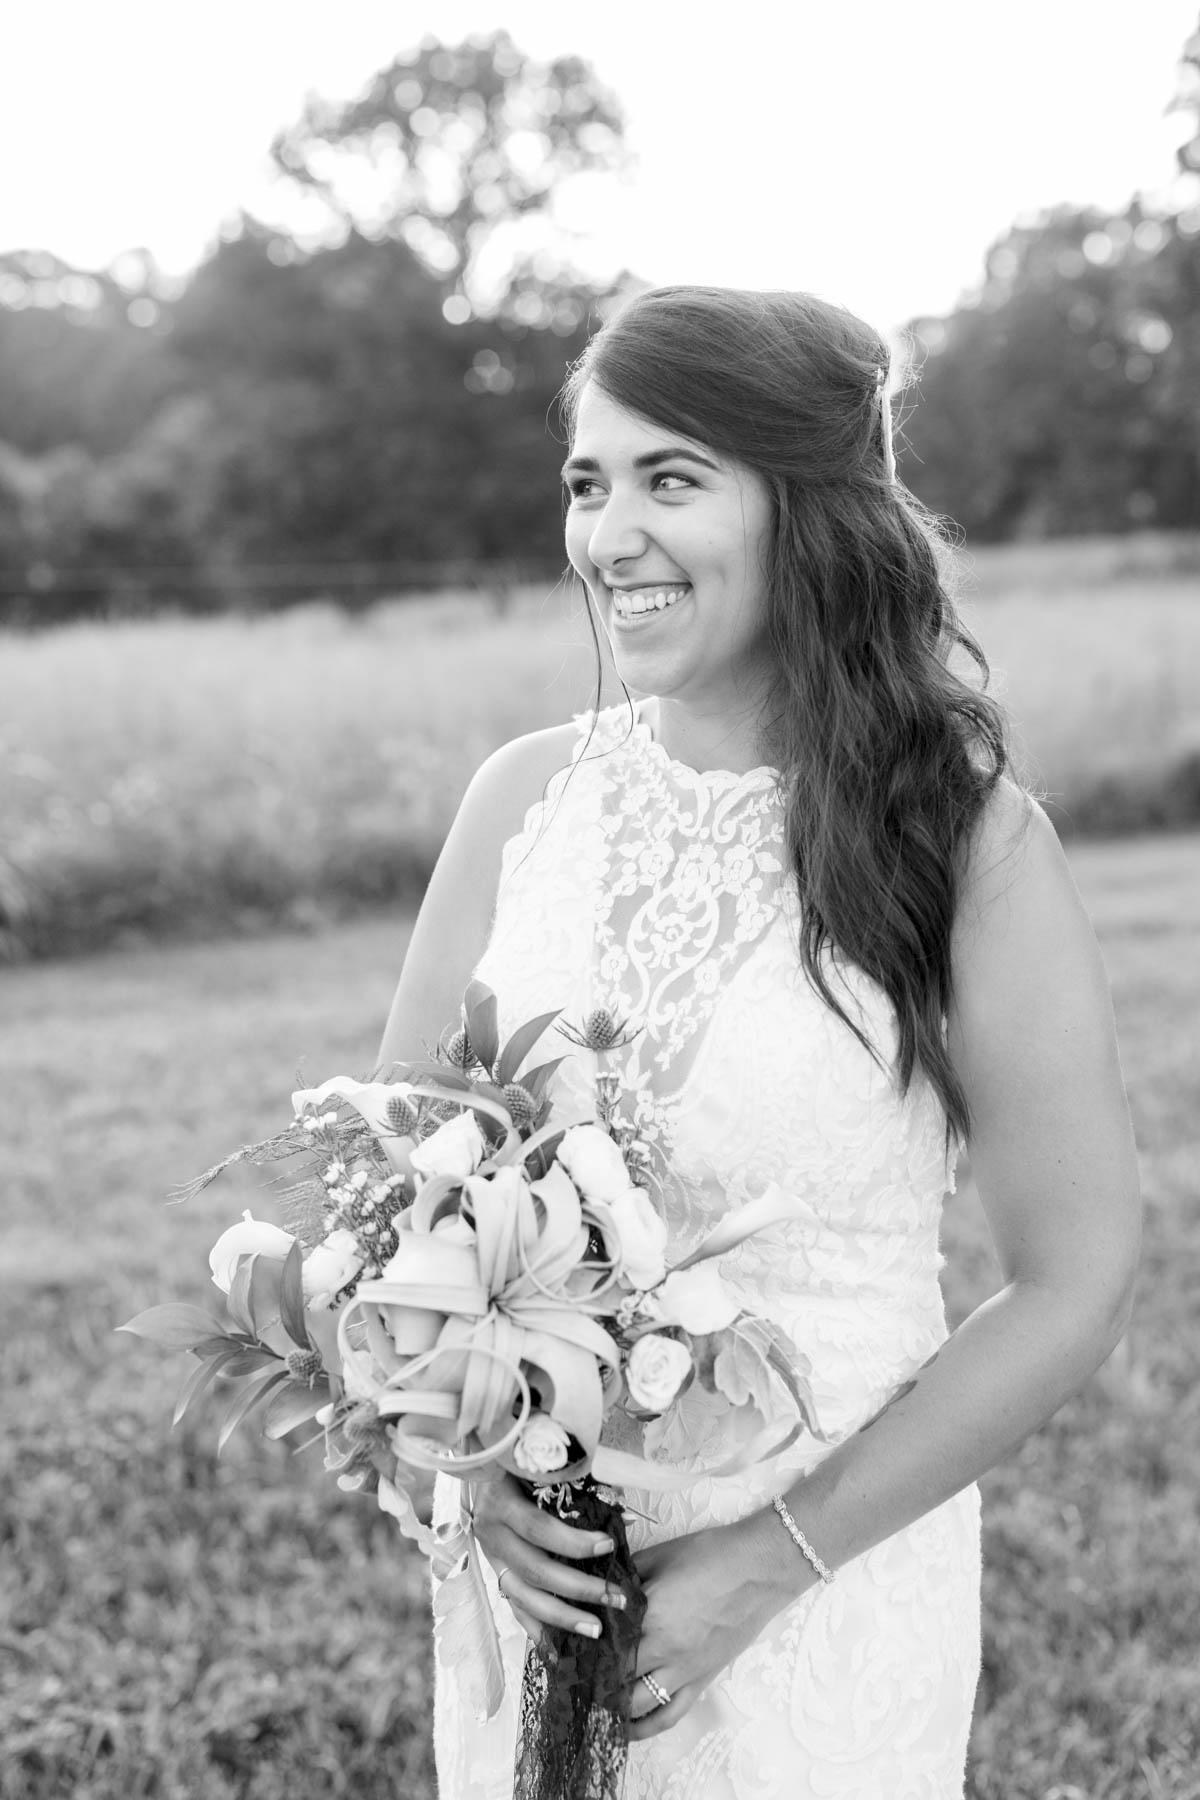 shotbychelsea_wedding_blog-42.jpg